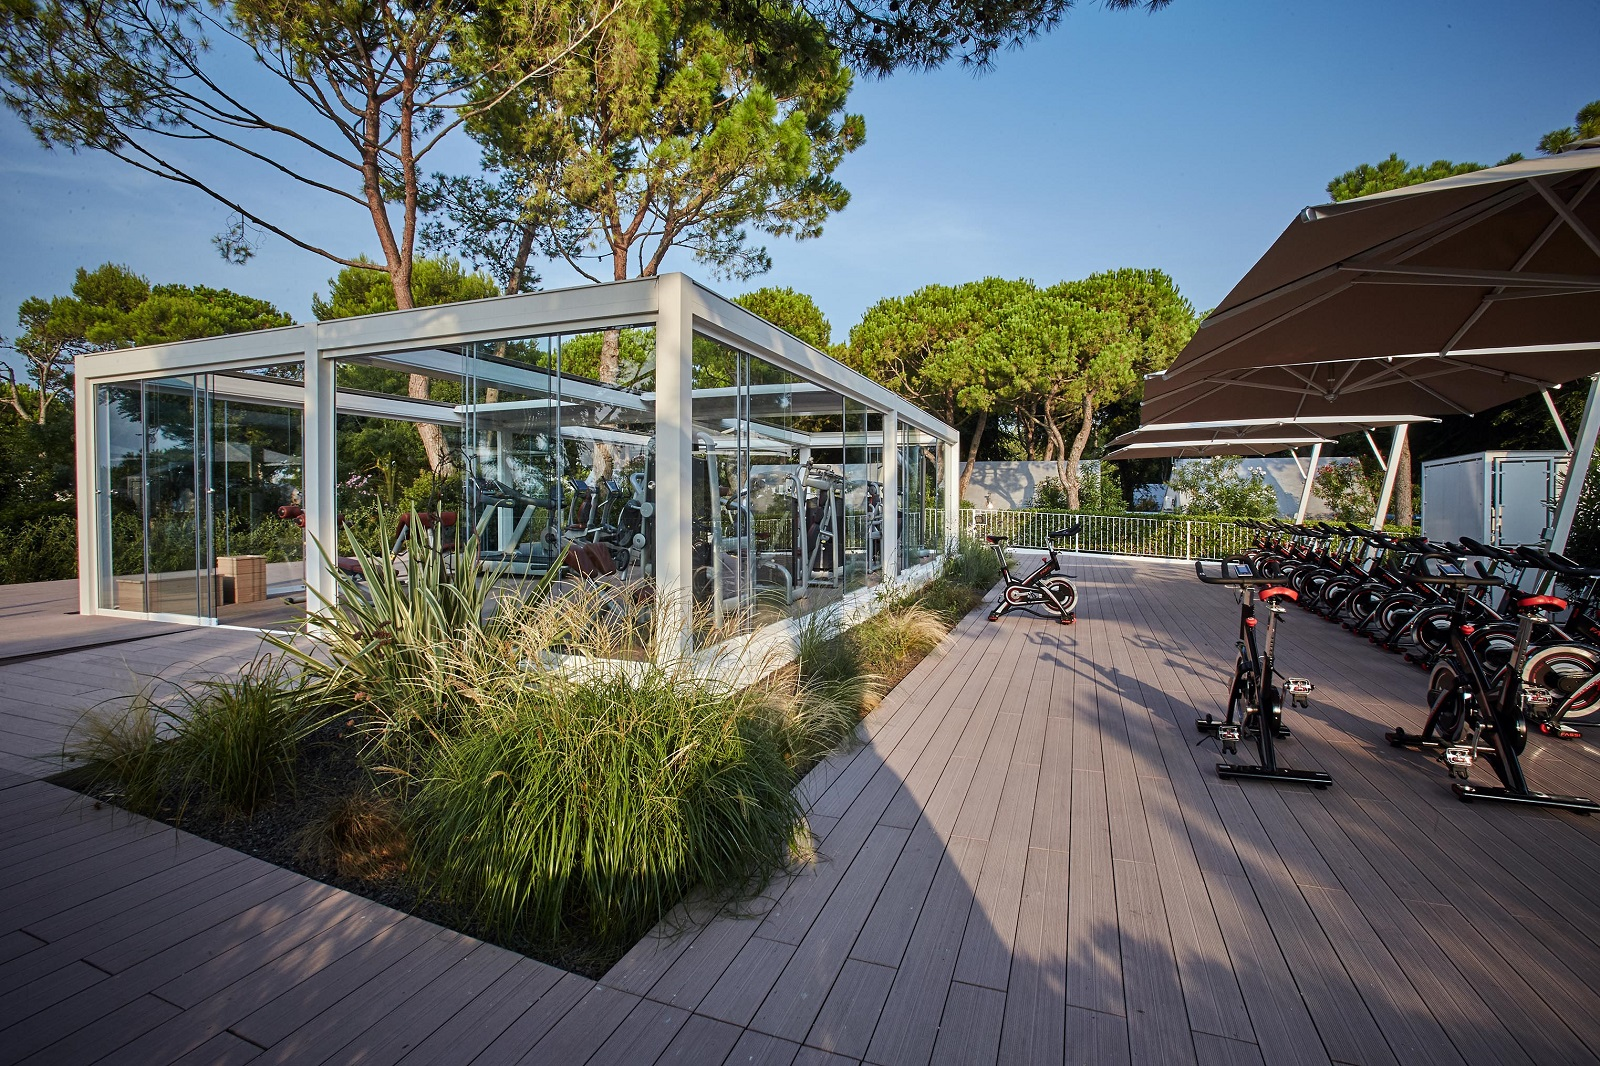 Fitness-Cavallino-Treporti